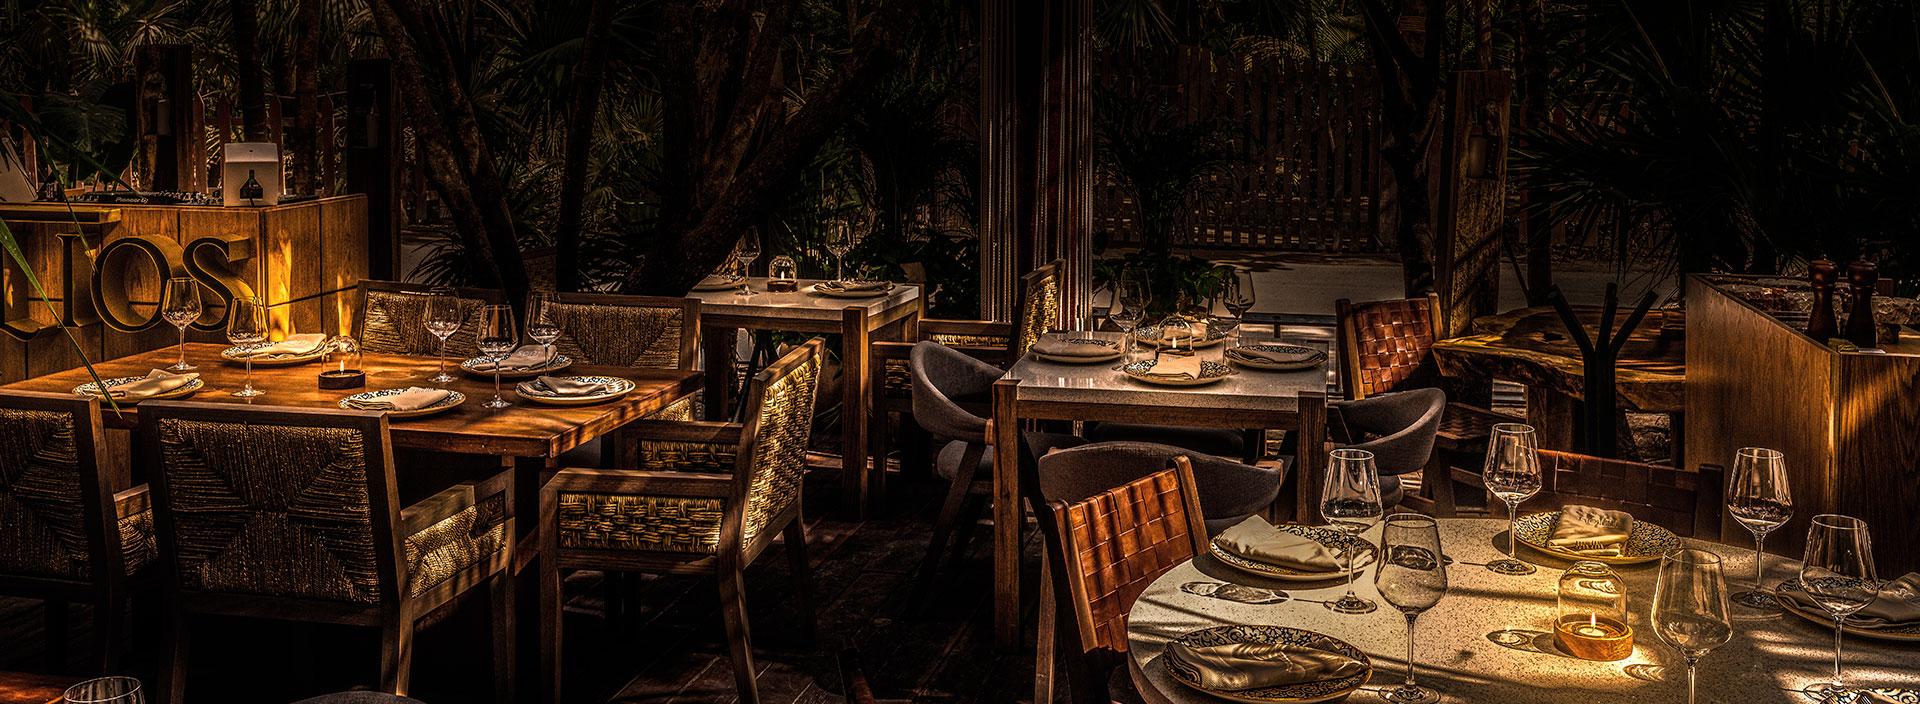 Greek Restaurant Tulum